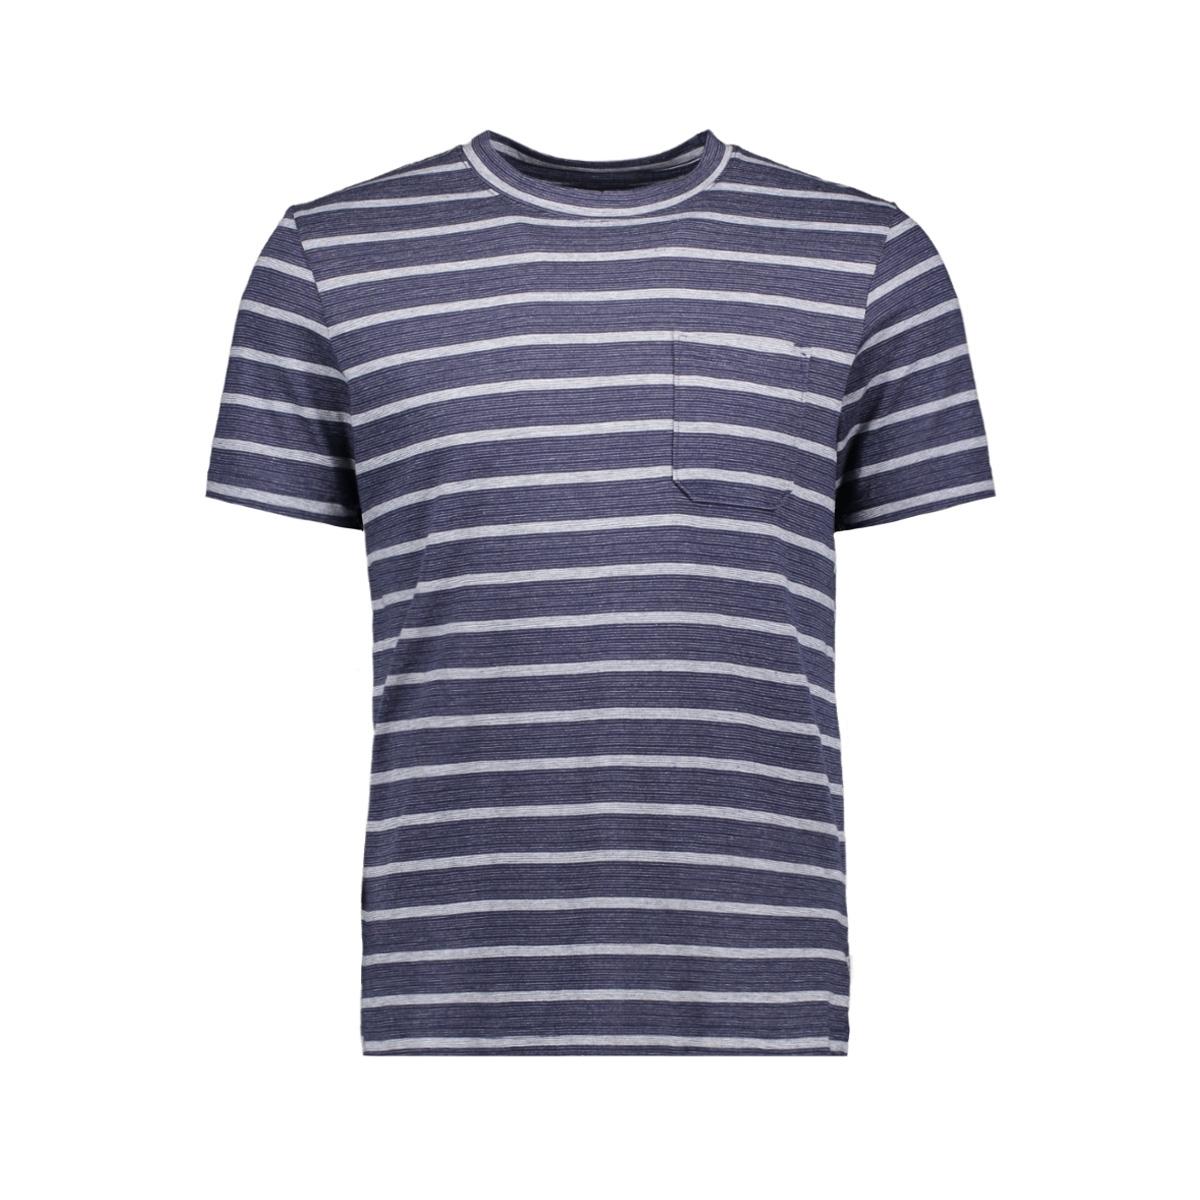 jcoklark tee ss crew neck 12152495 jack & jones t-shirt maritime blue/slim